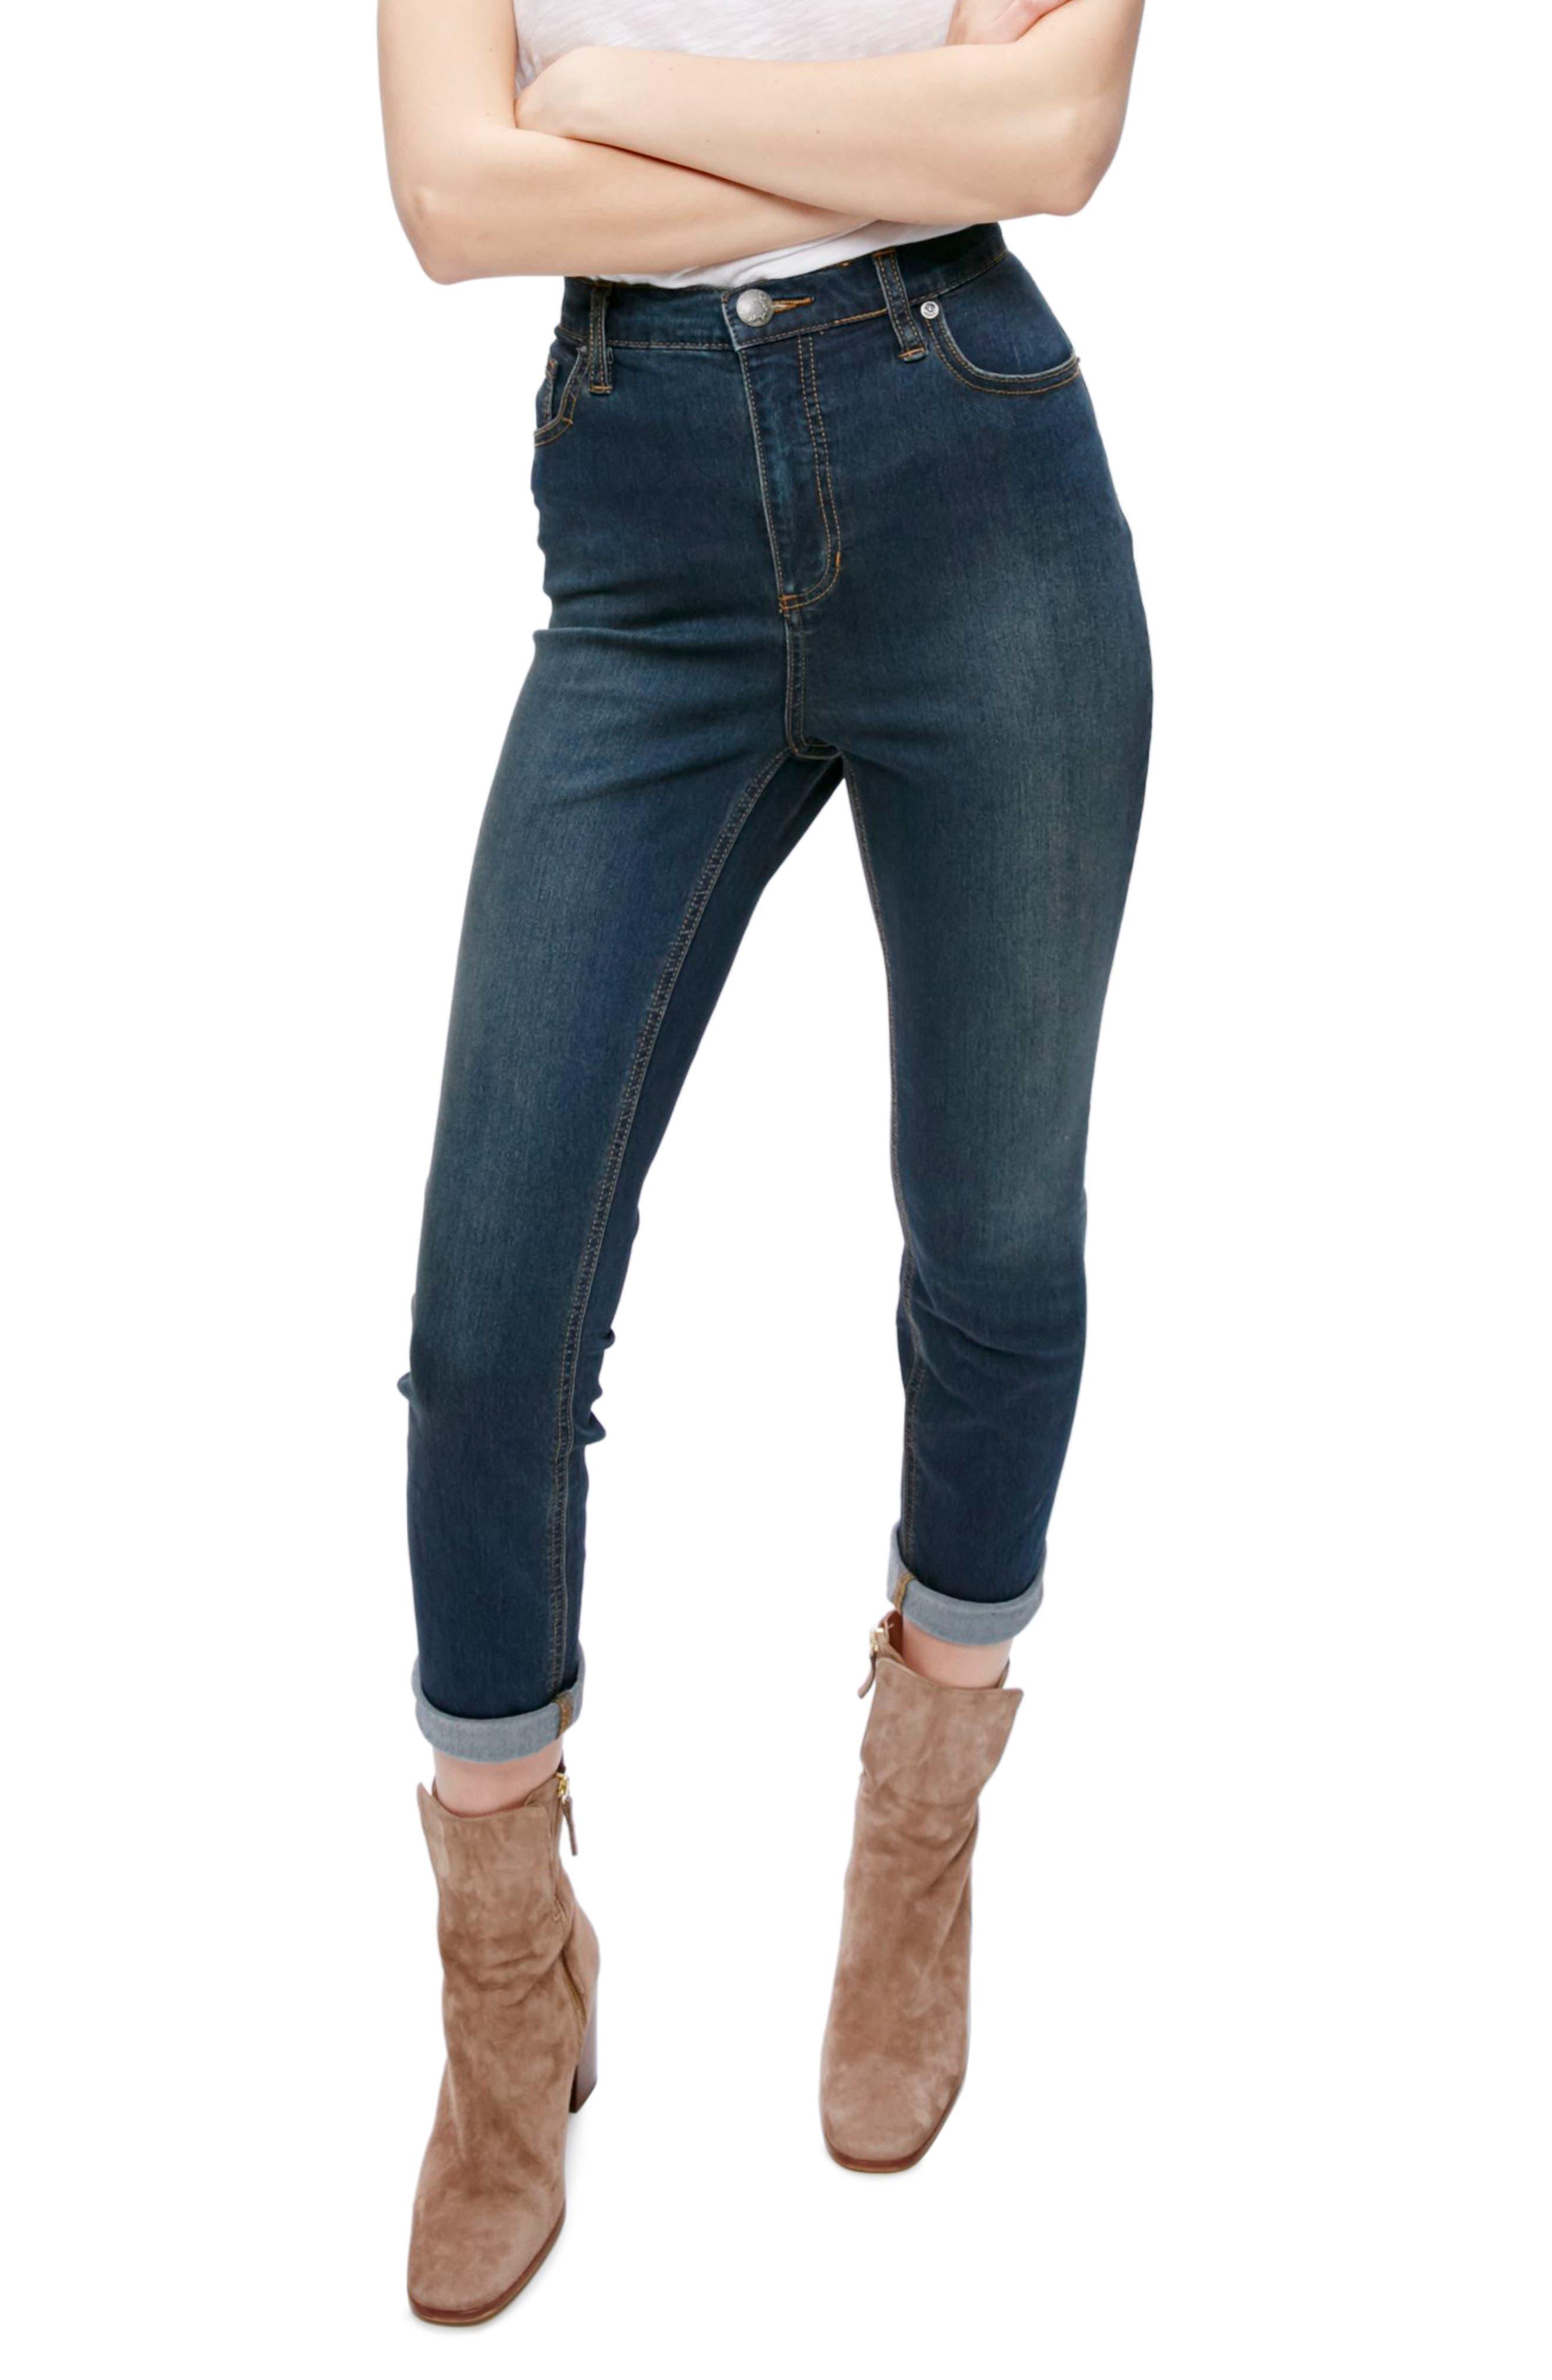 Gummy High Waist Jeans,                             Main thumbnail 1, color,                             Cane Wash